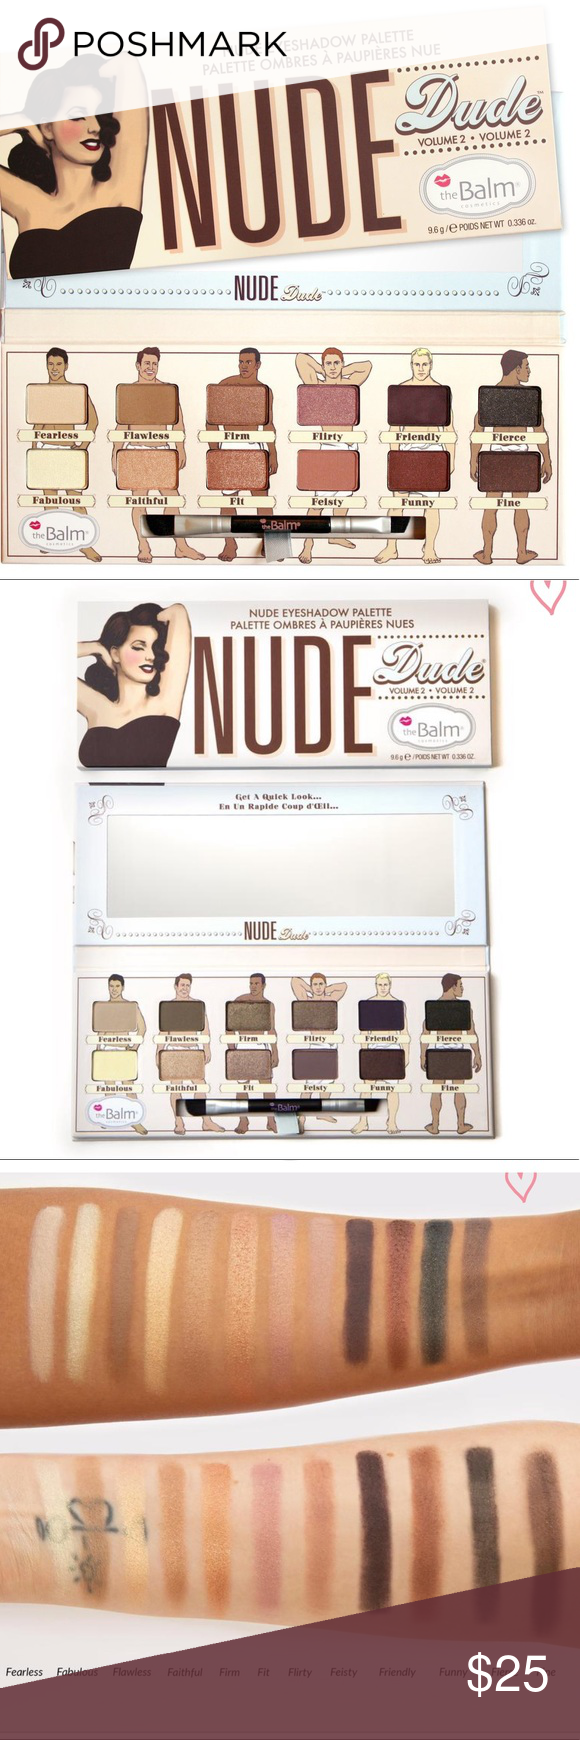 Shop theBalm NUDE dude Eyeshadow Palette - Free Shipping